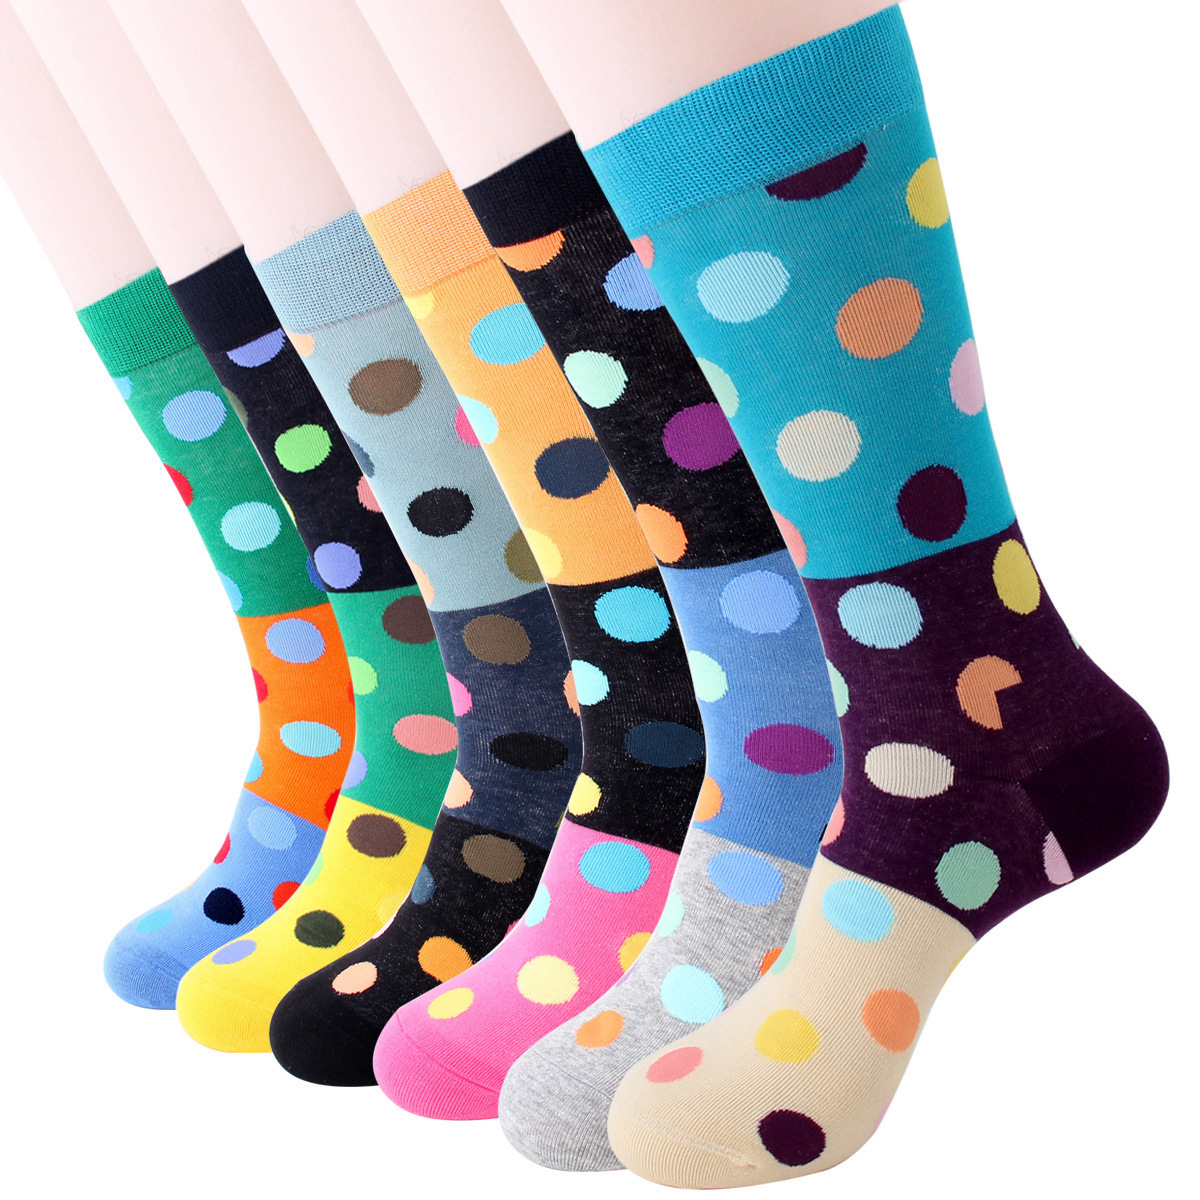 PEONFLY 2020 Fashion Colorful Dot Cotton Men Happy Socks Personality Tide Brand Harajuku Casual Funny Socks Casual Meias